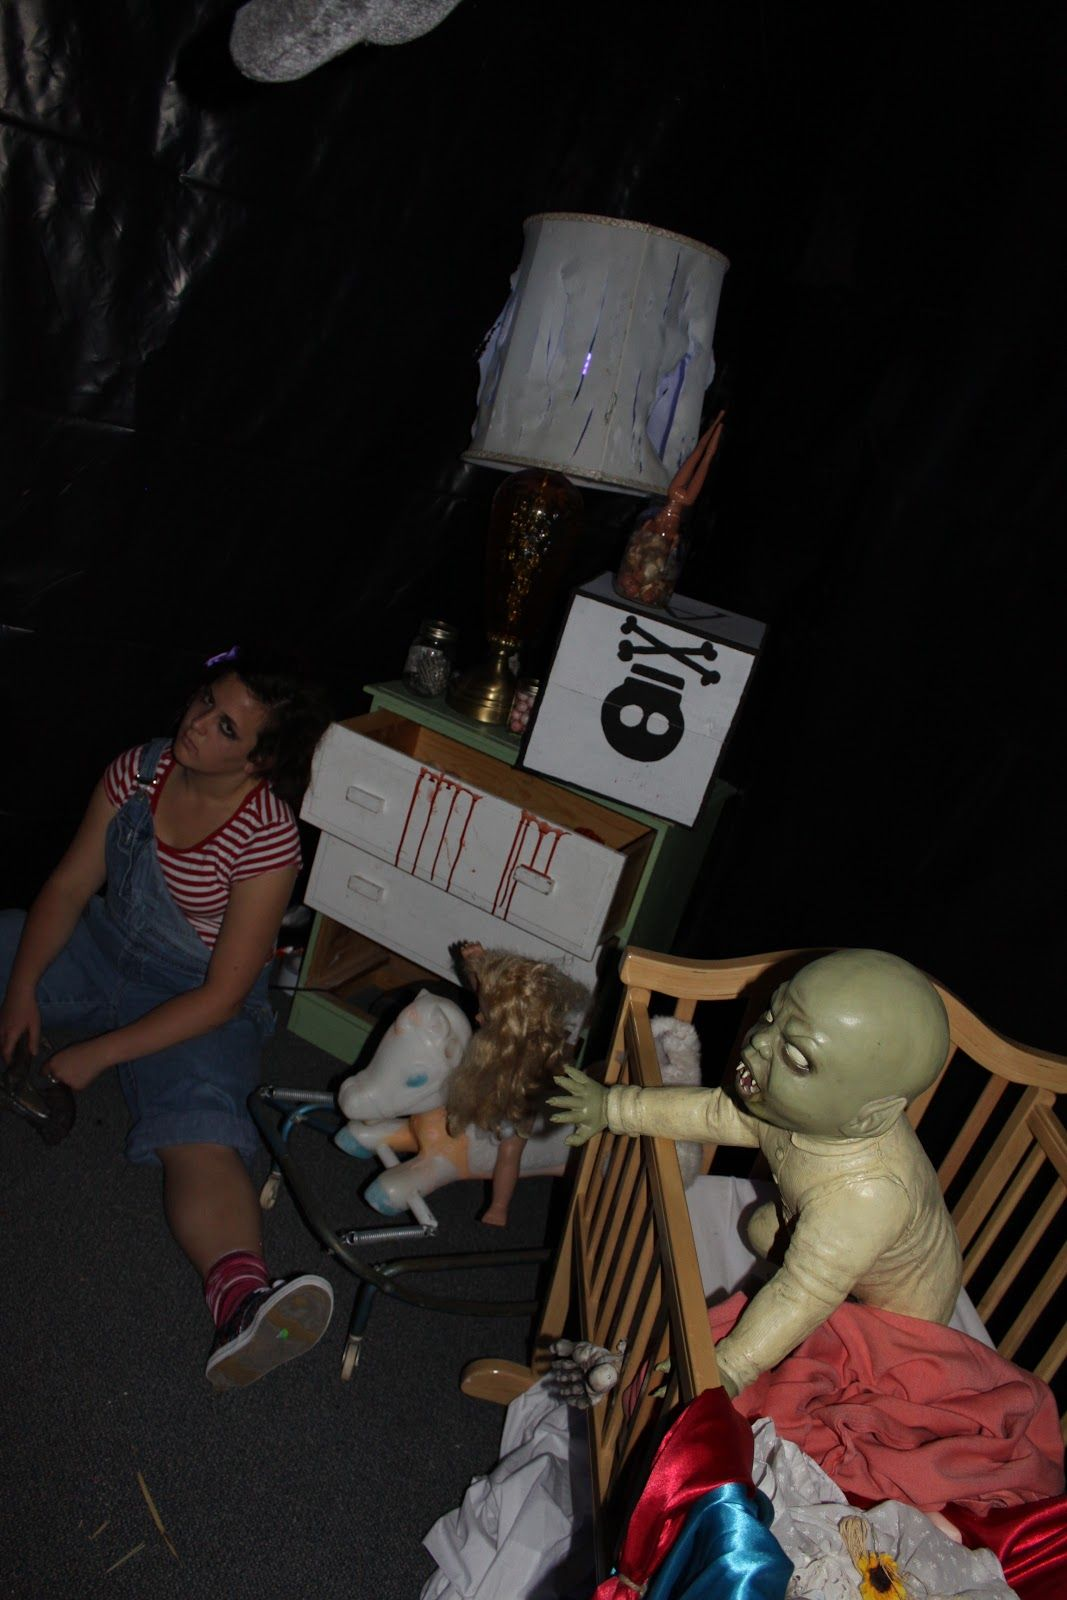 Img 9883 Jpg 1067 1600 Creepy Doll Halloween Scary Haunted House Halloween Carnival